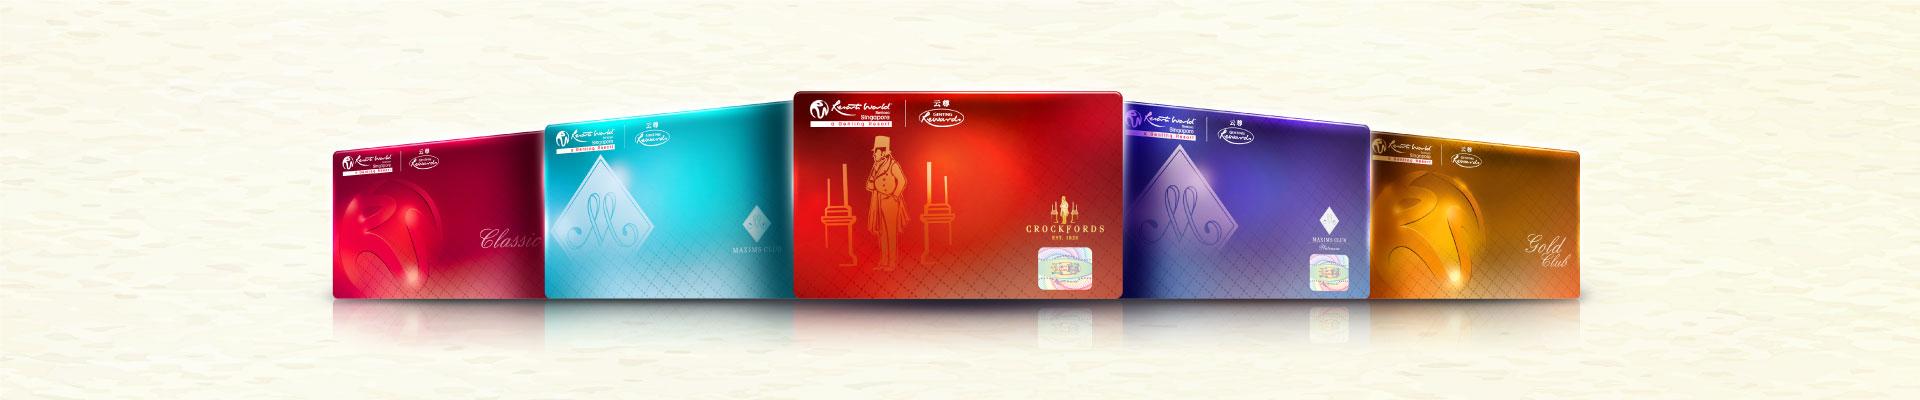 GR Portal HeroBanner-5 Cards